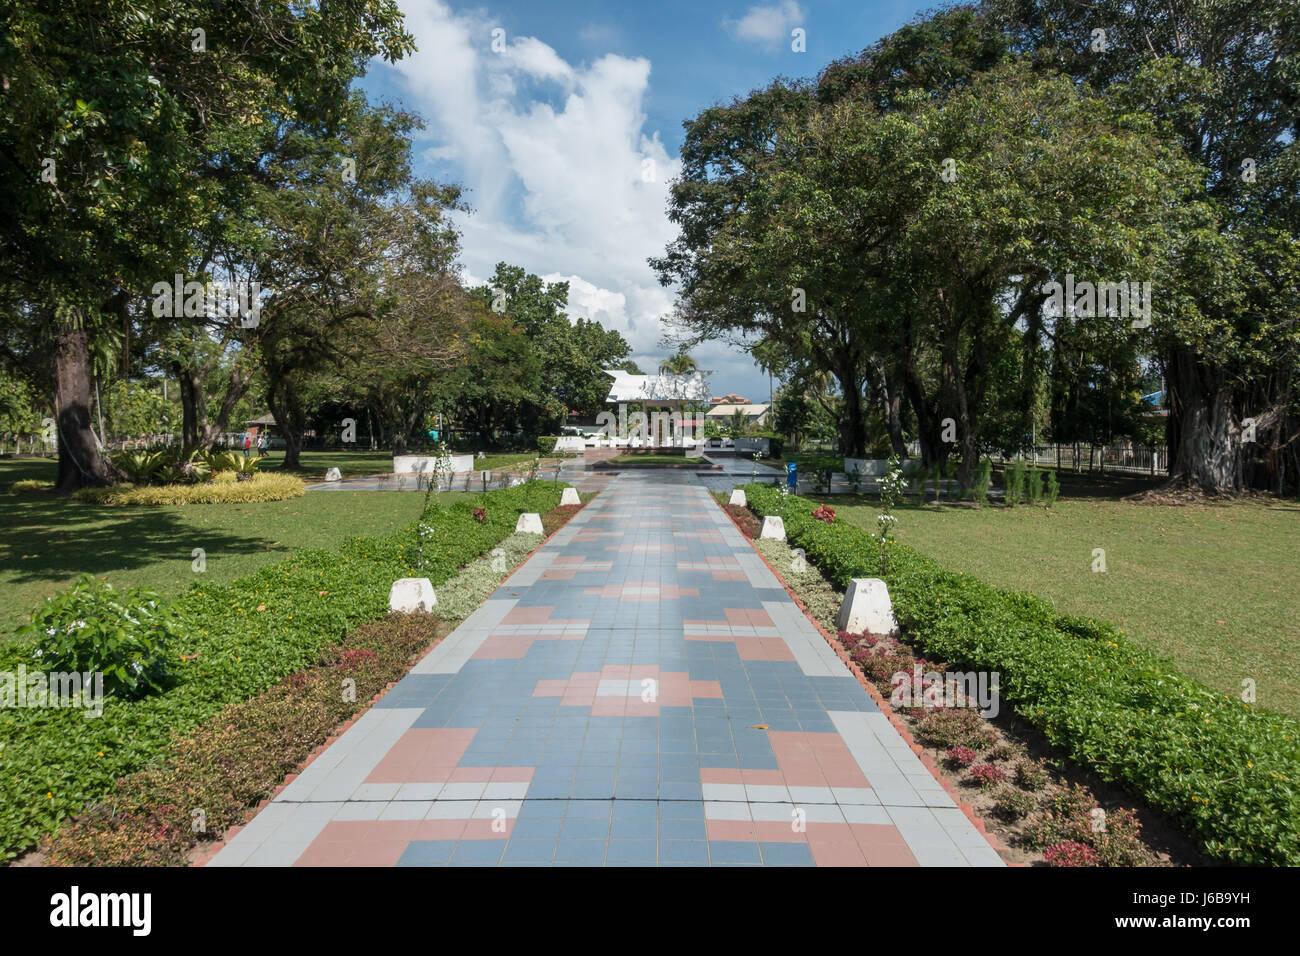 Petagas War Memorial, Kota Kinabalu, Borneo. A memorial to the Malaysian guerrilla movement that fought the Japanese - Stock Image